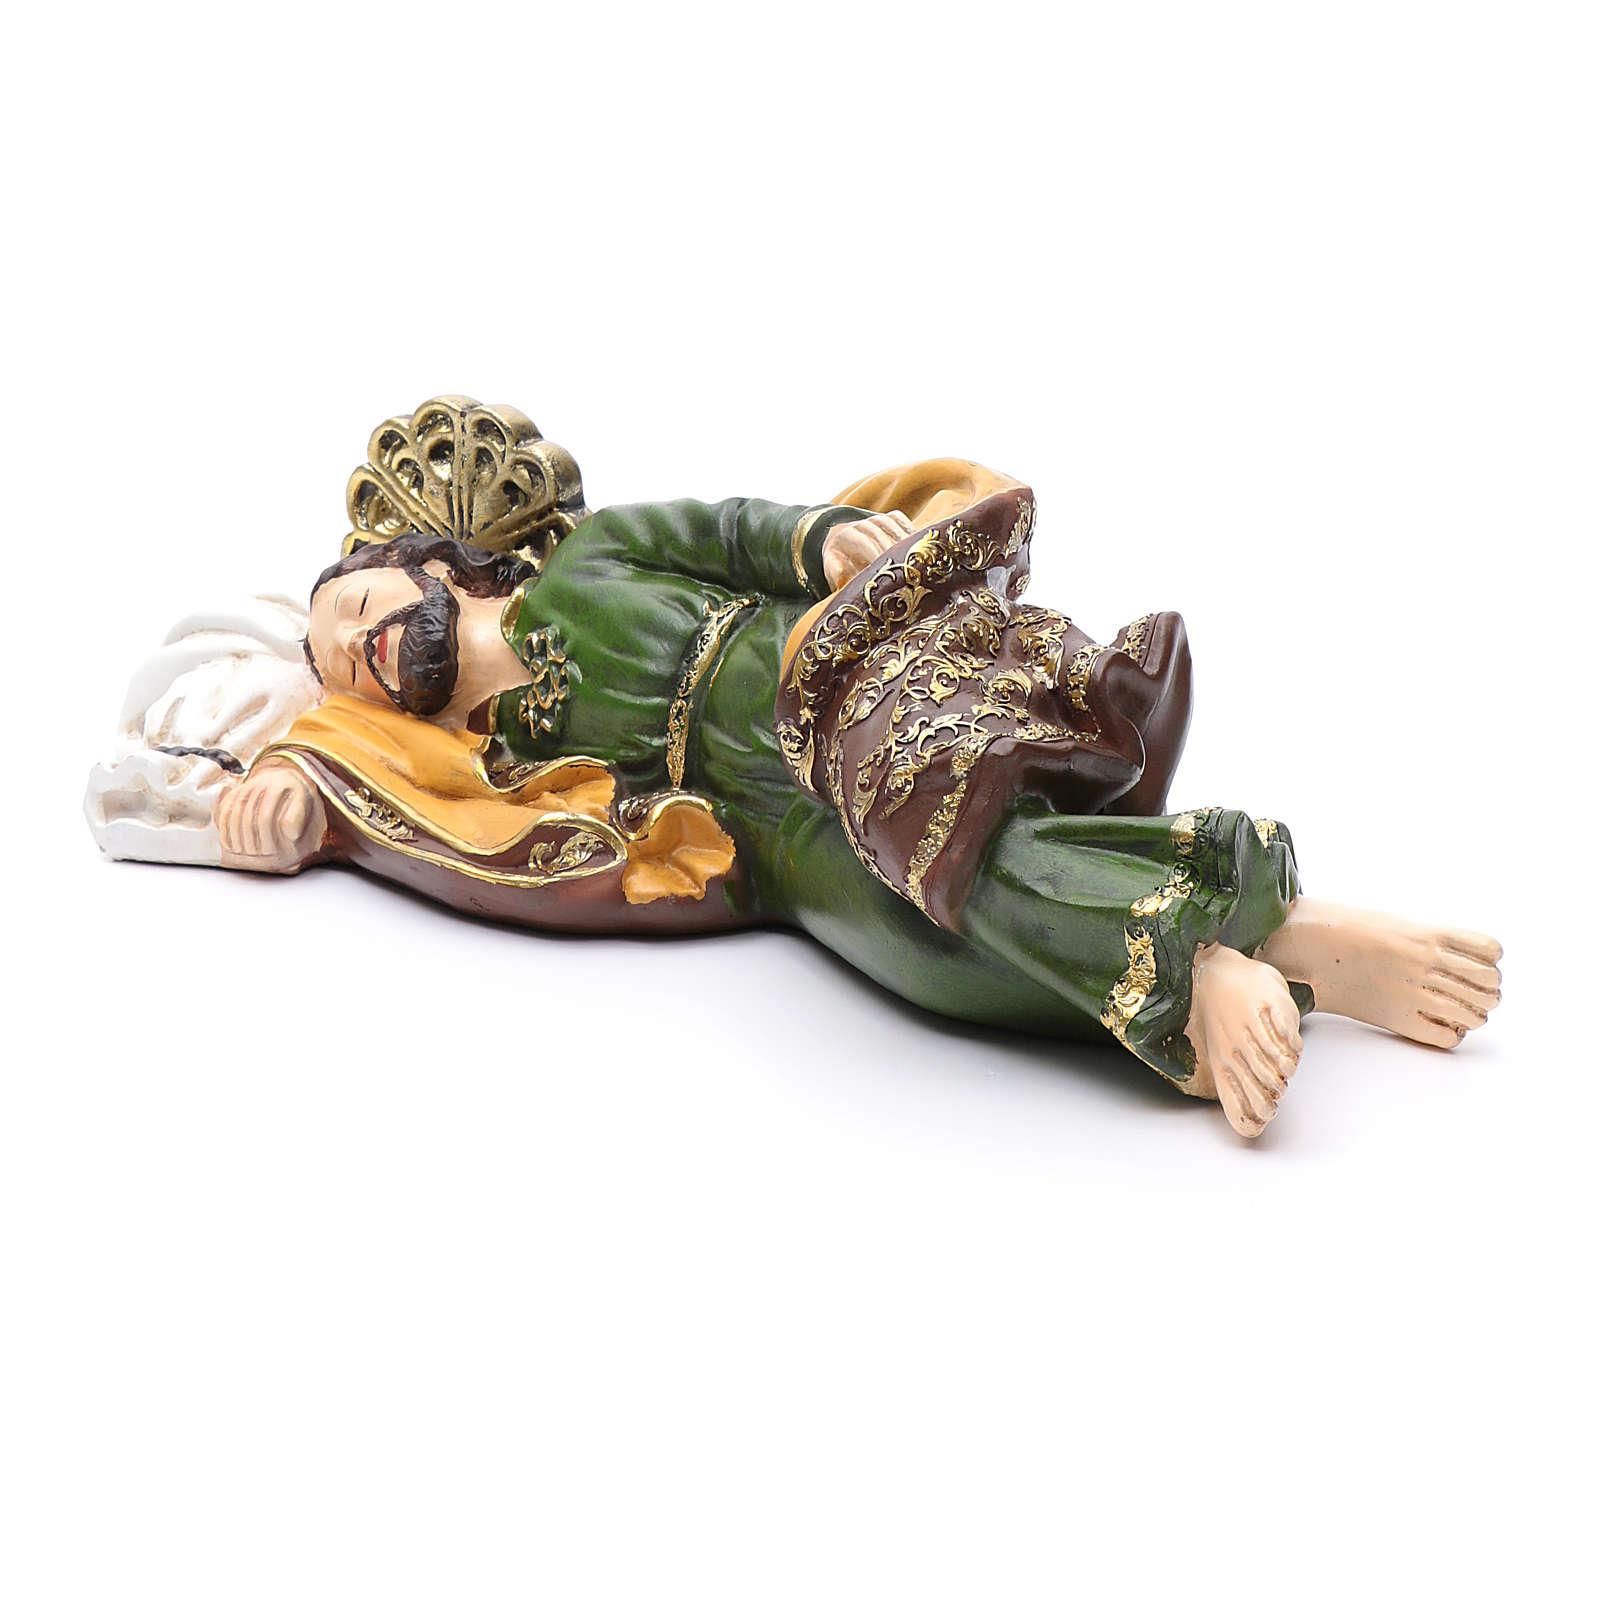 Nativity scene statue Saint Joseph sleeping 40 cm 3